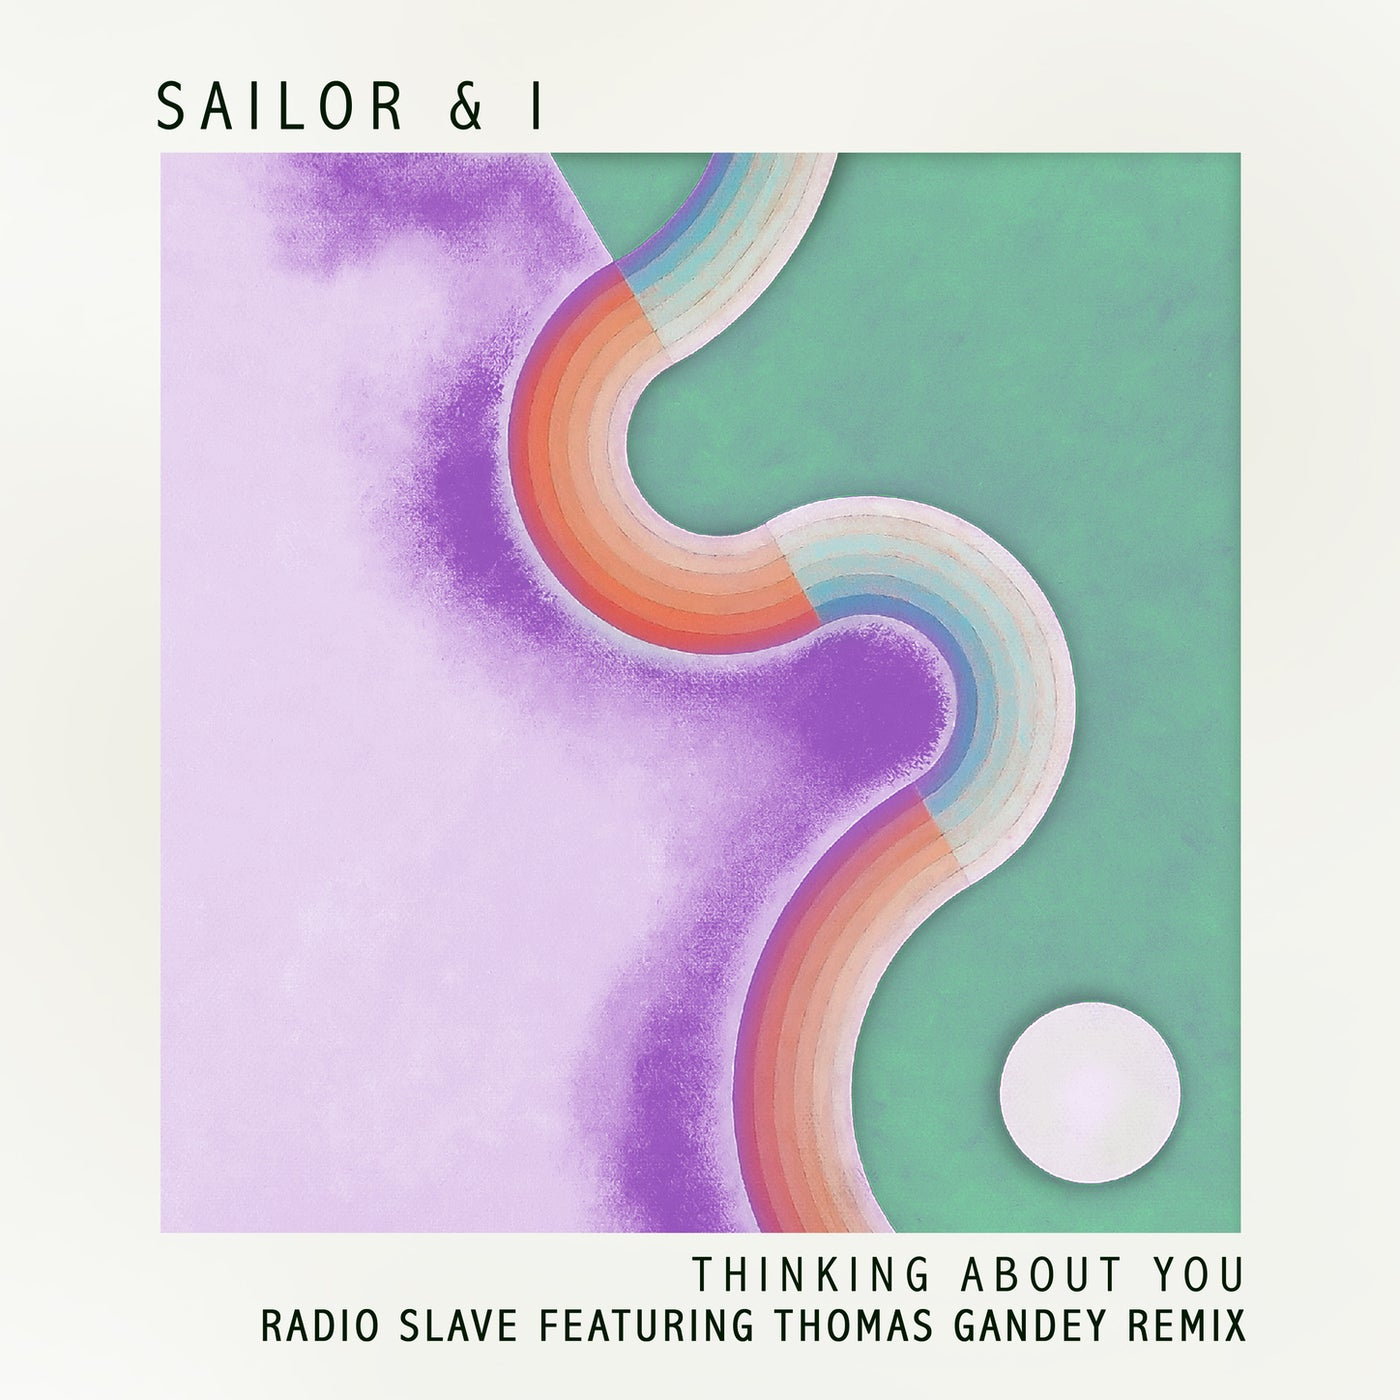 Thinking About You (Radio Slave feat. Thomas Gandey Remix)